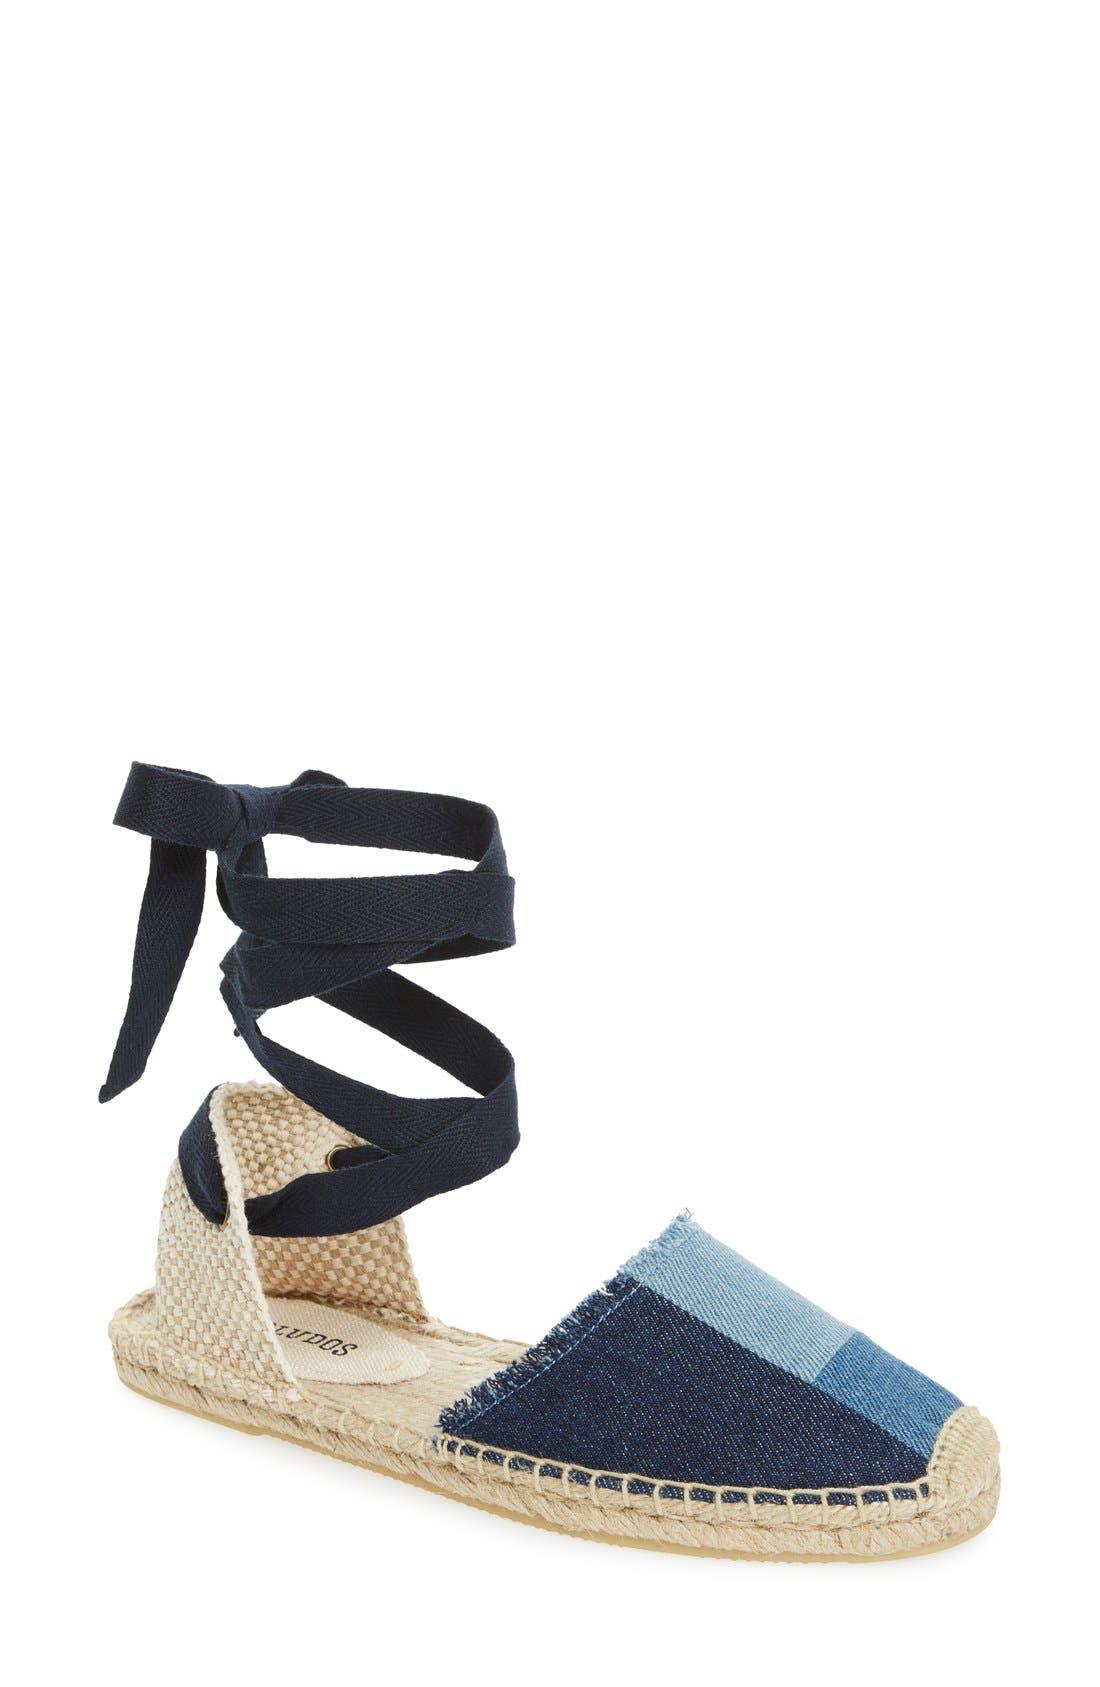 Soludos Patchwork Ankle Wrap Espadrille (Women)